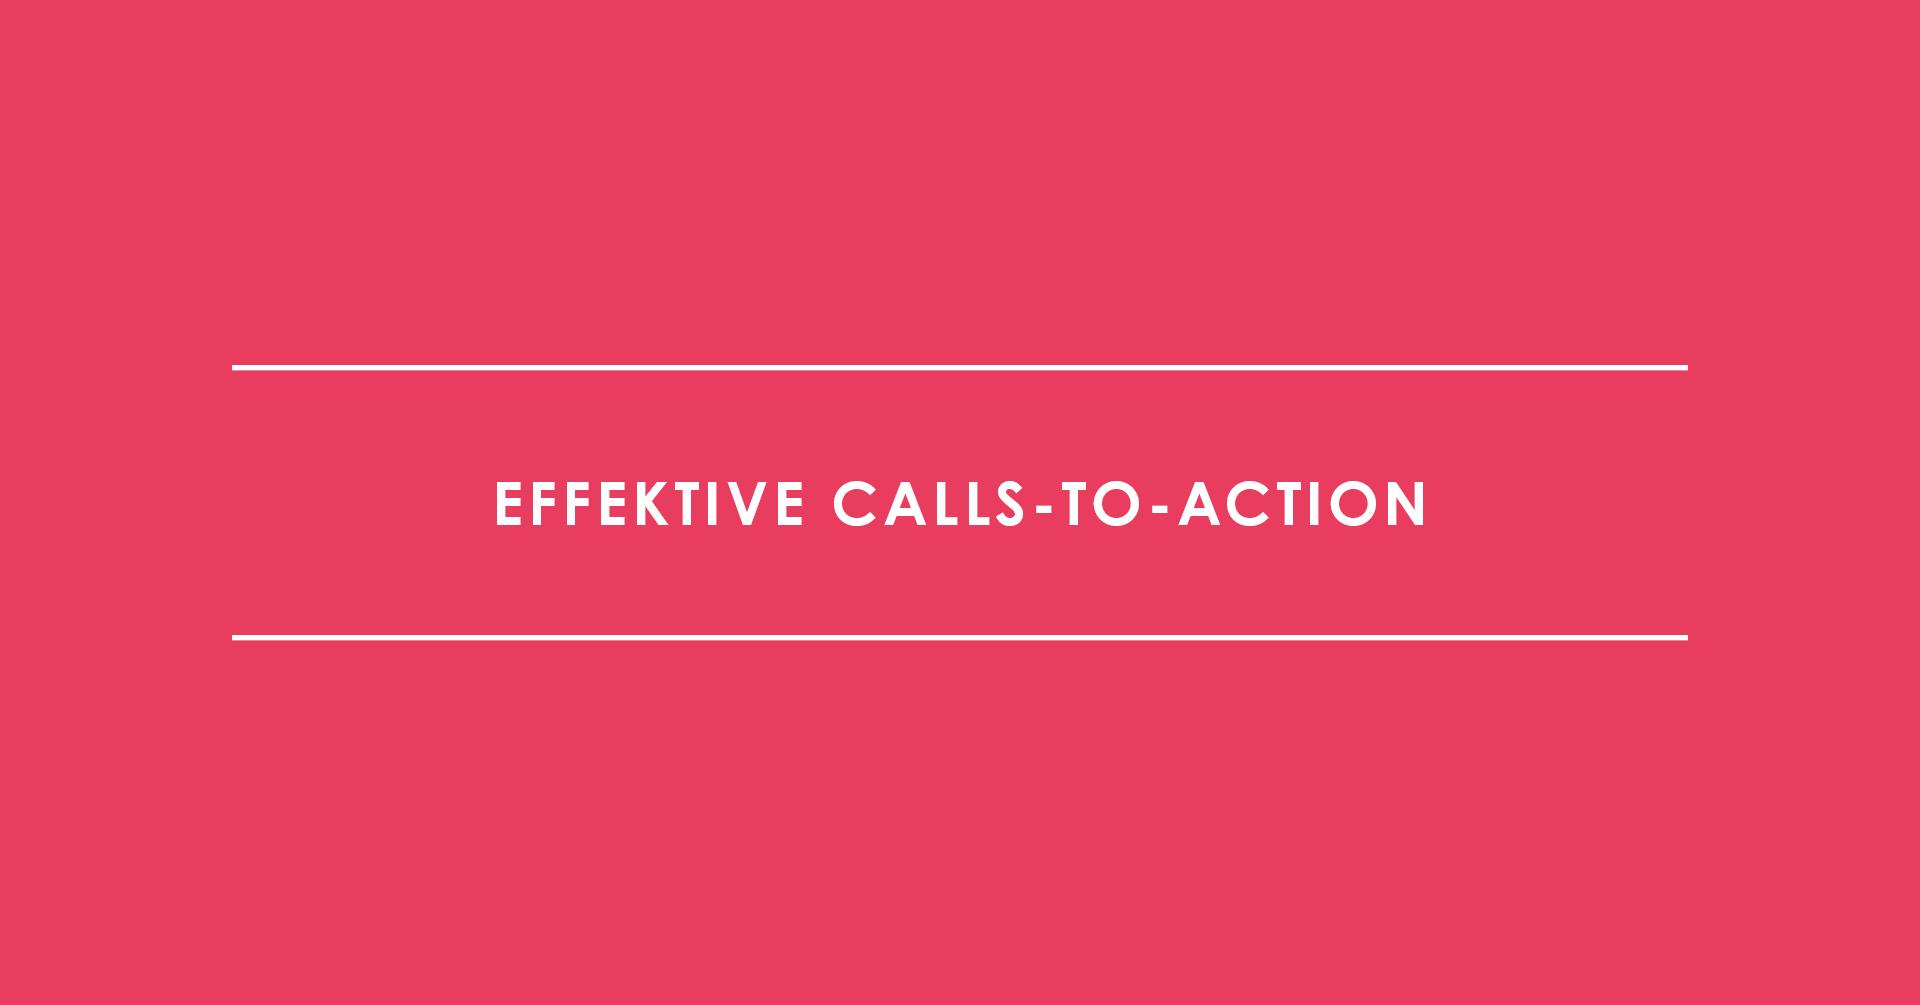 Effektive Calls-to-Action